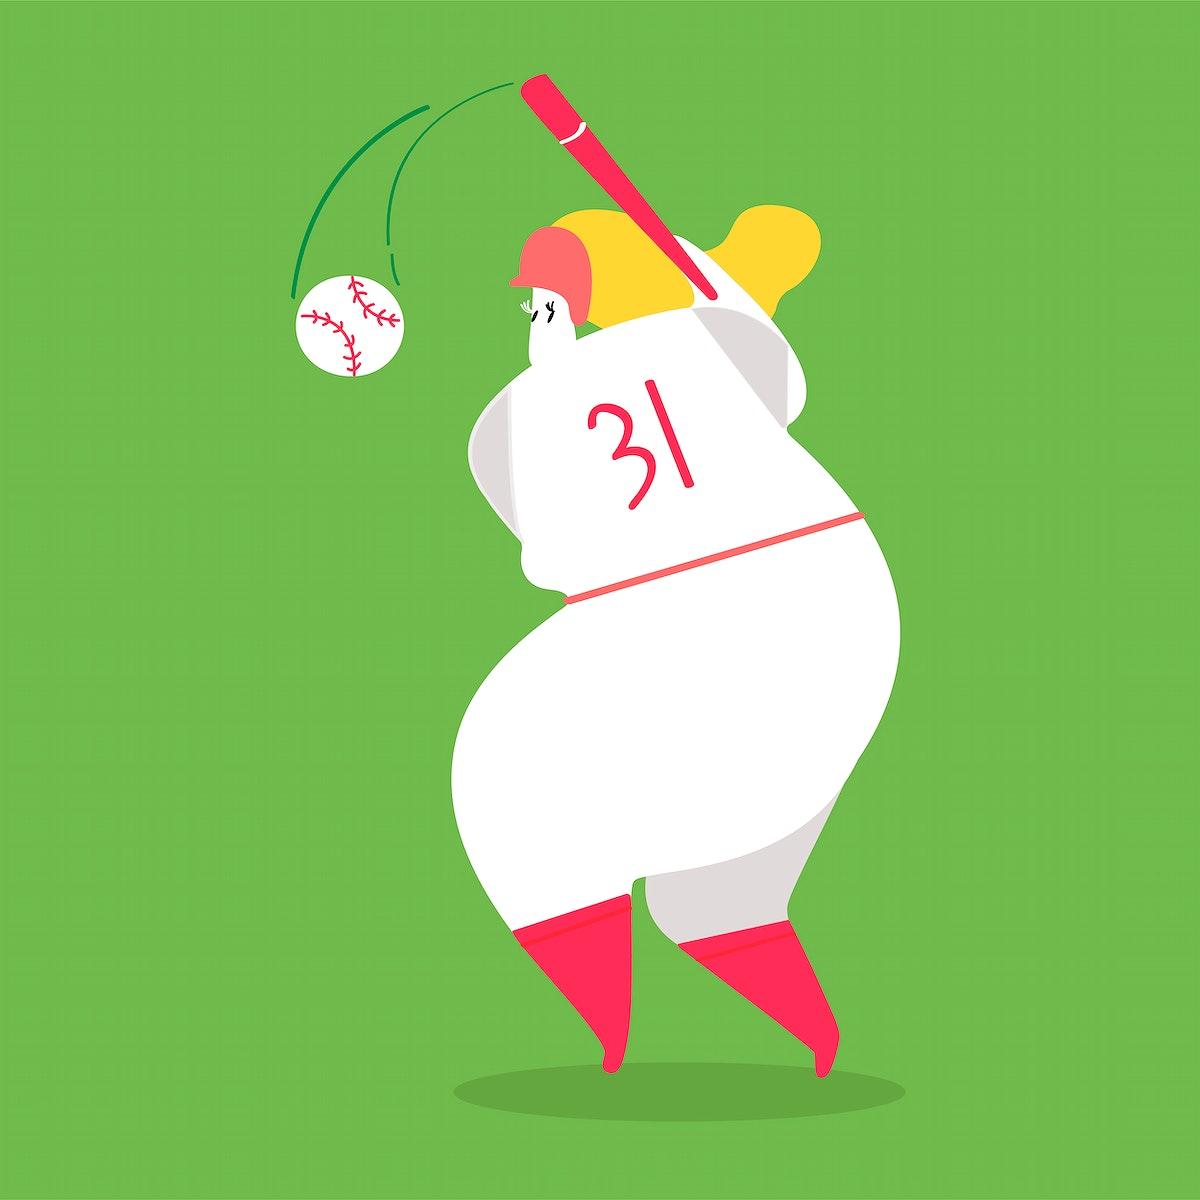 Character illustration of a baseball player